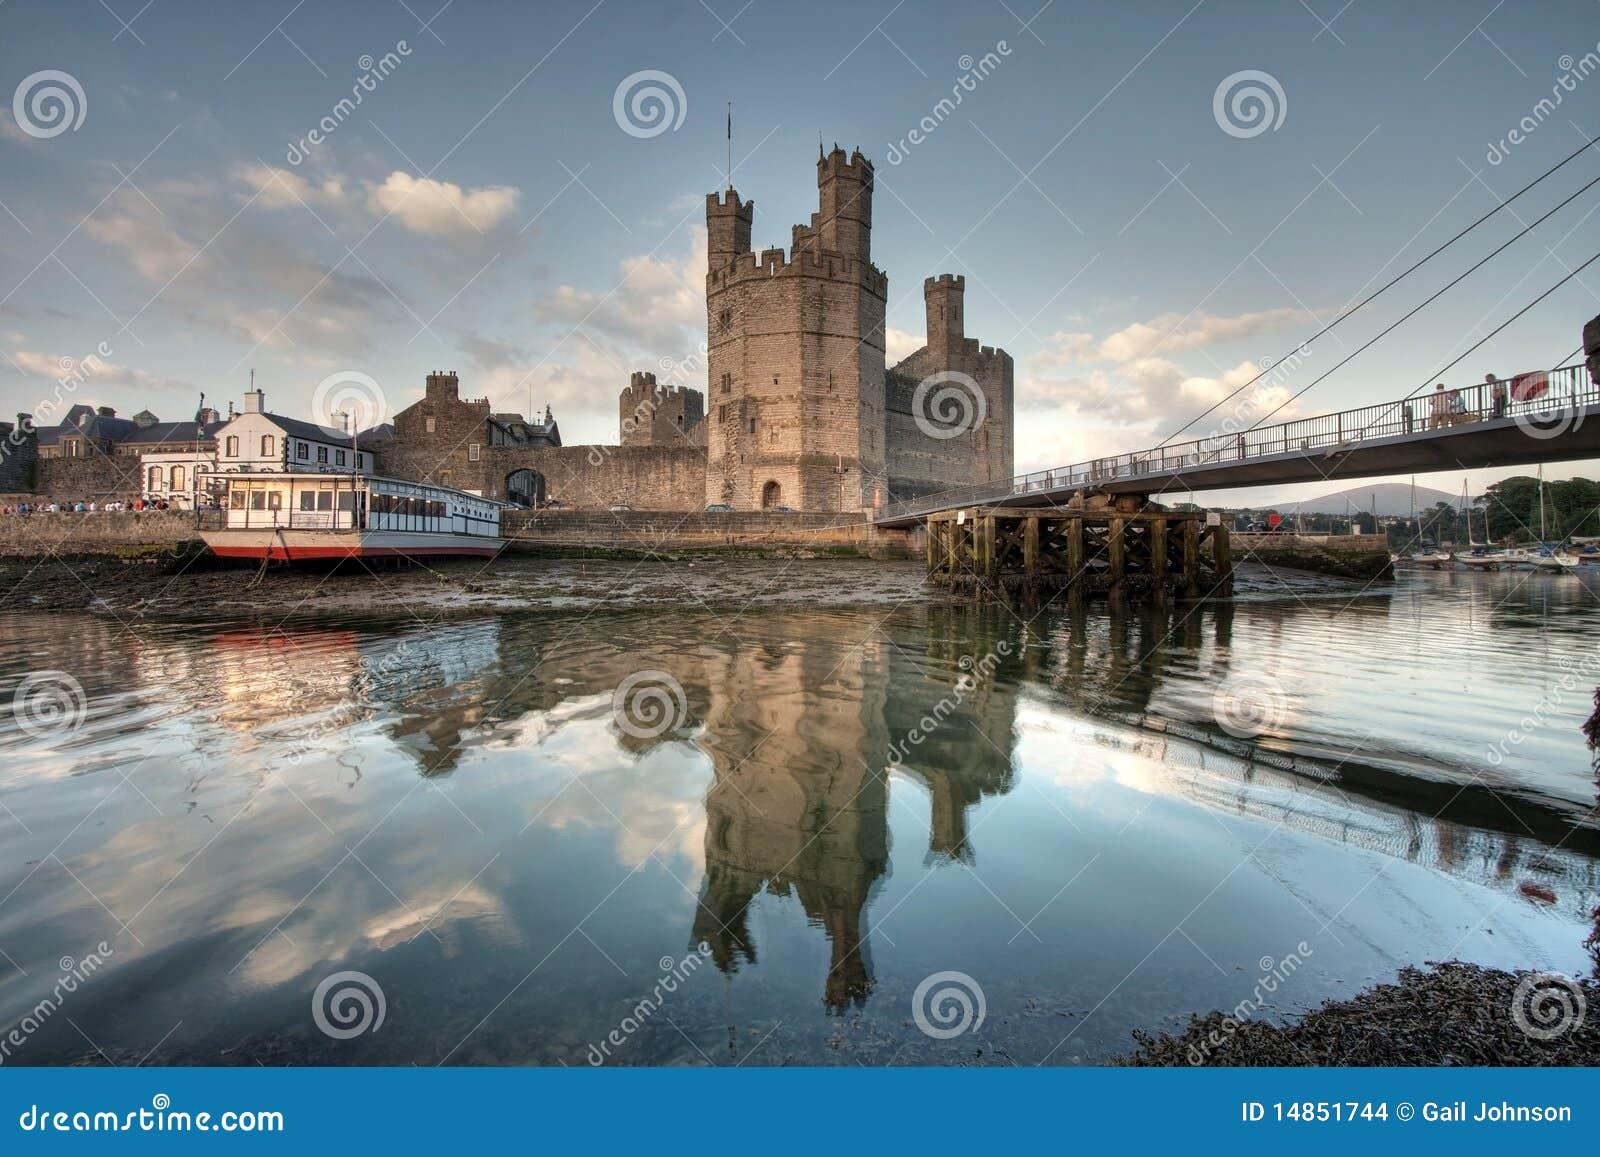 Caernarfon,castle